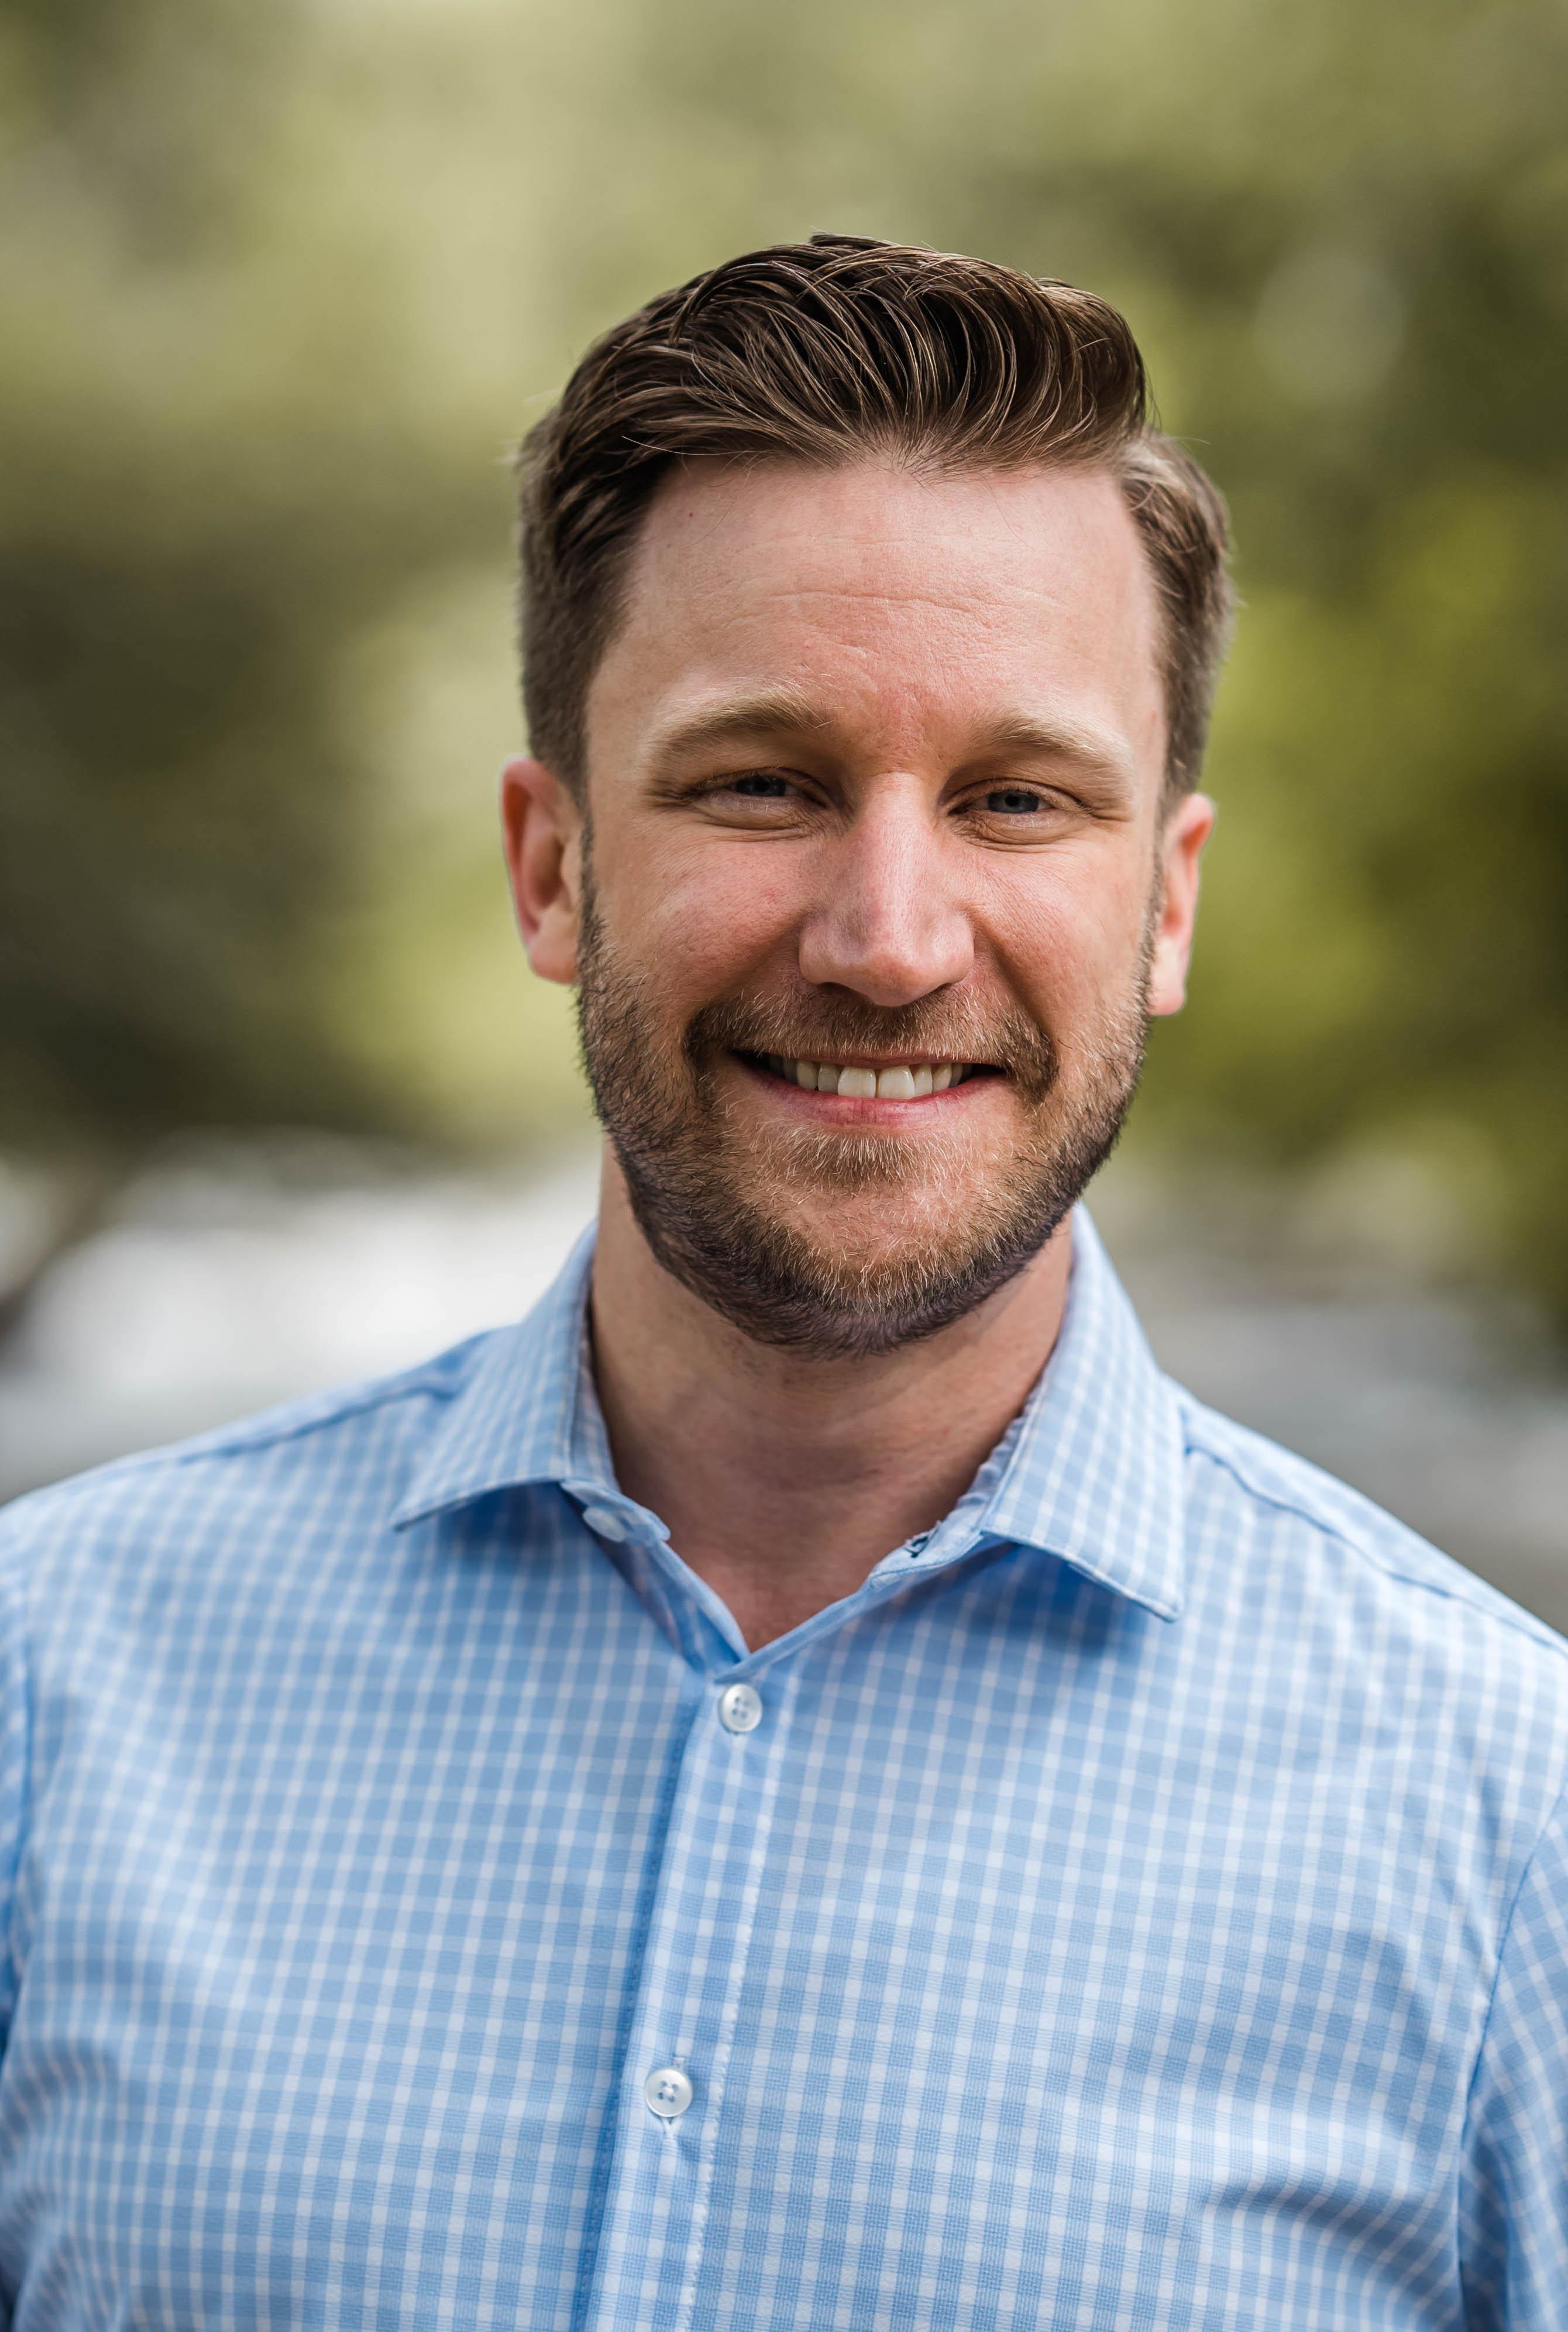 Jack Jostes - Ramblin Jackson CEO 2019 Headshot